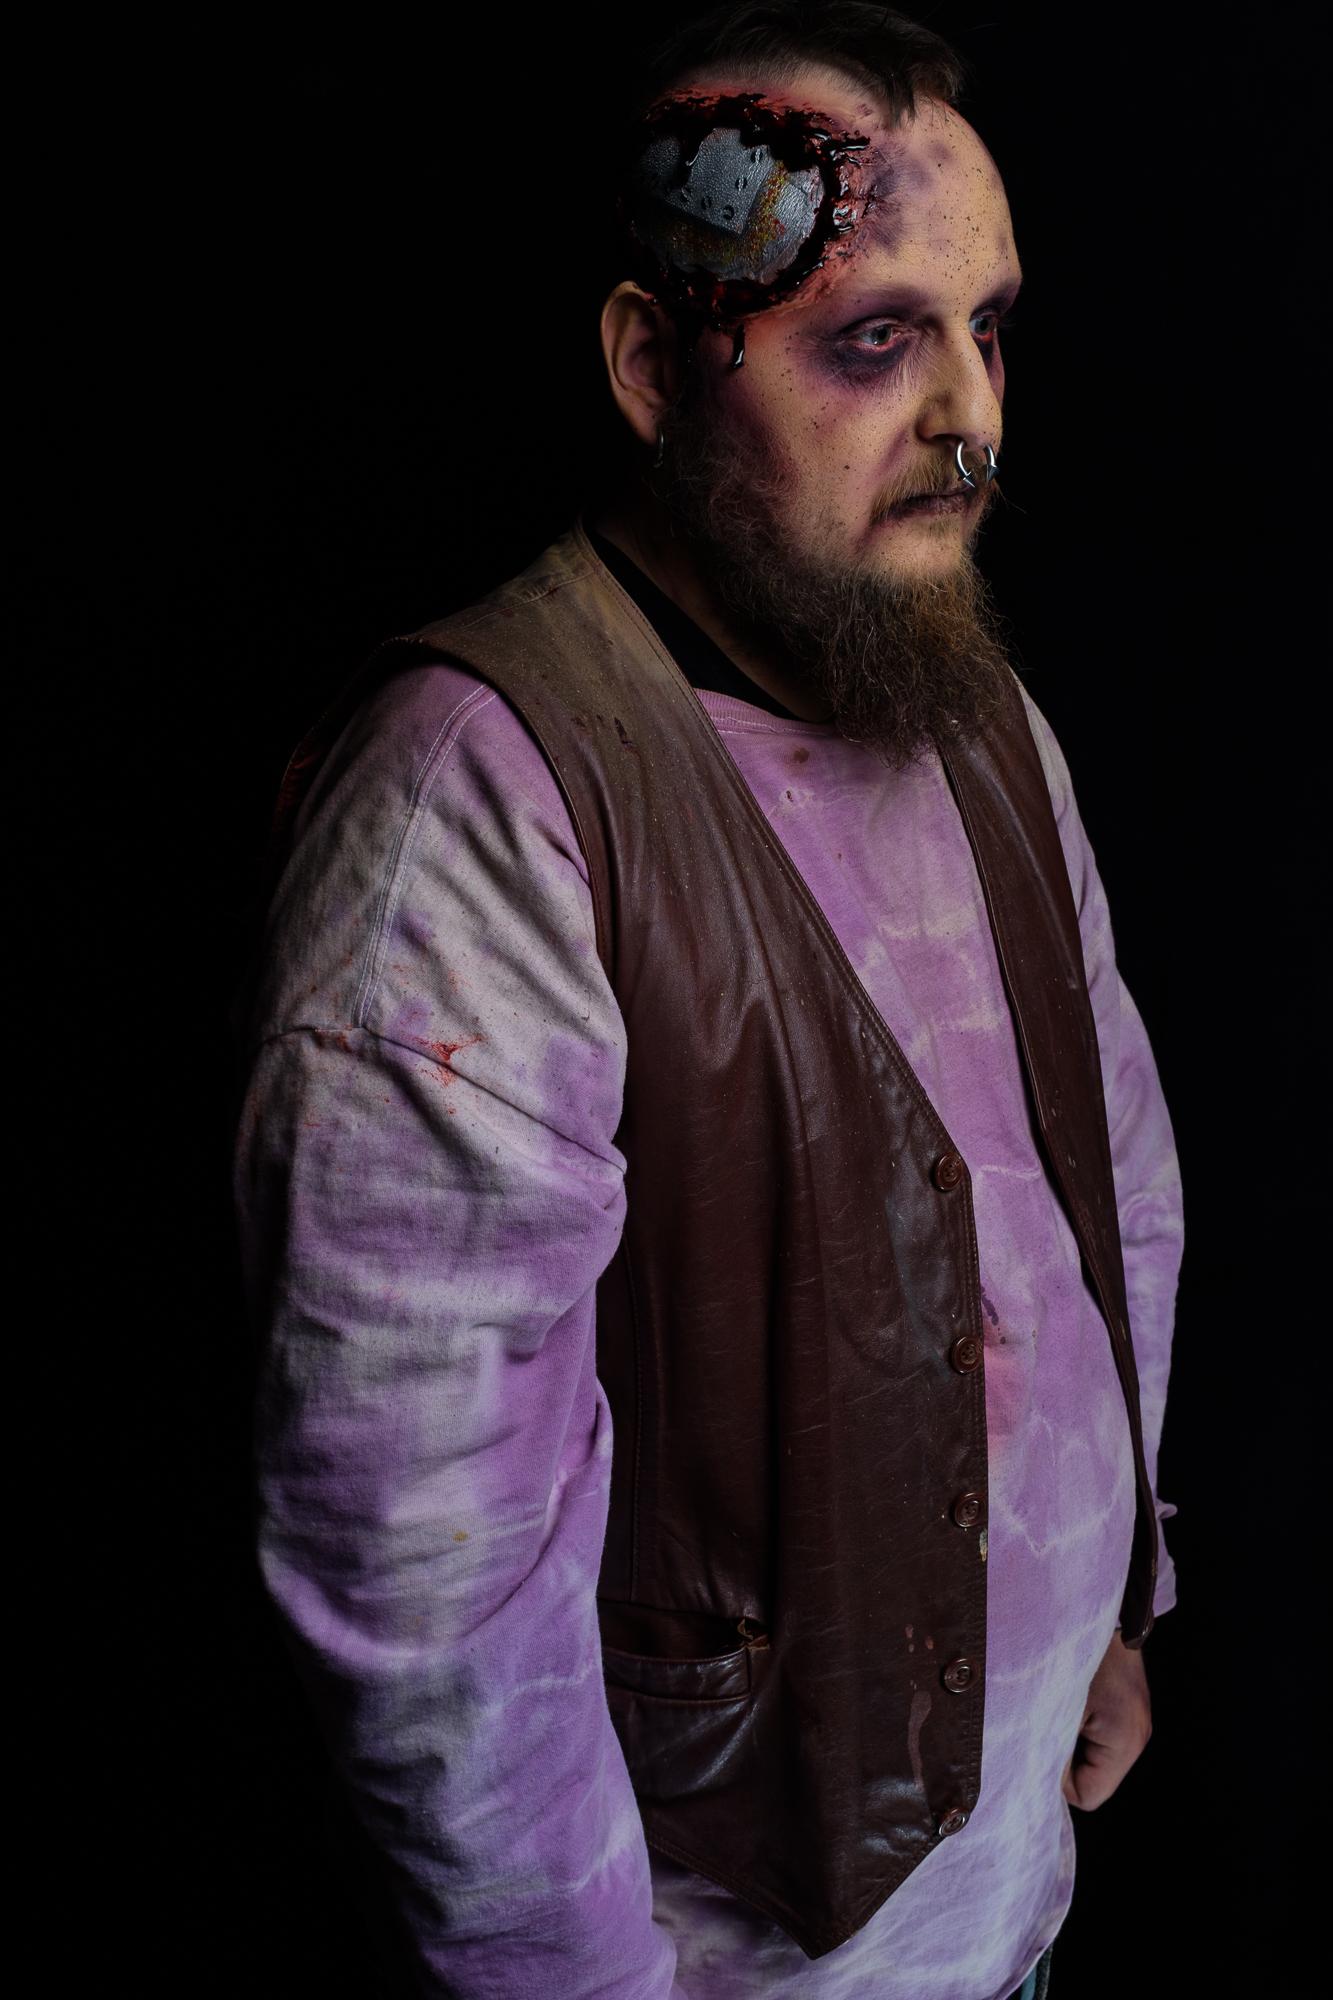 Photo by Danny Alexander  Makeup: Myself  Actor: Taz Walston